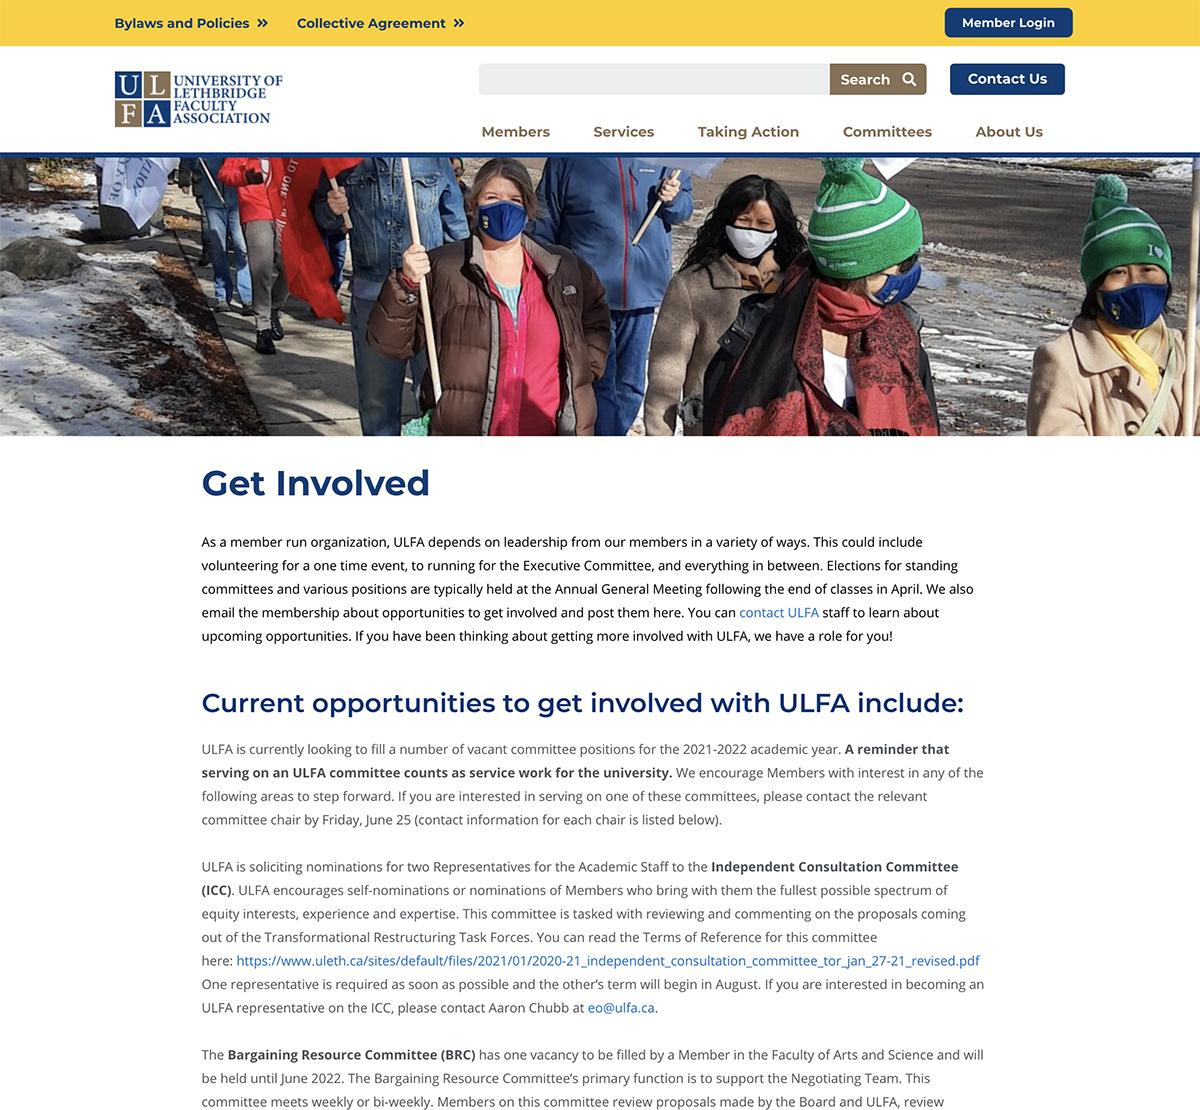 ULFA Get Involved Page